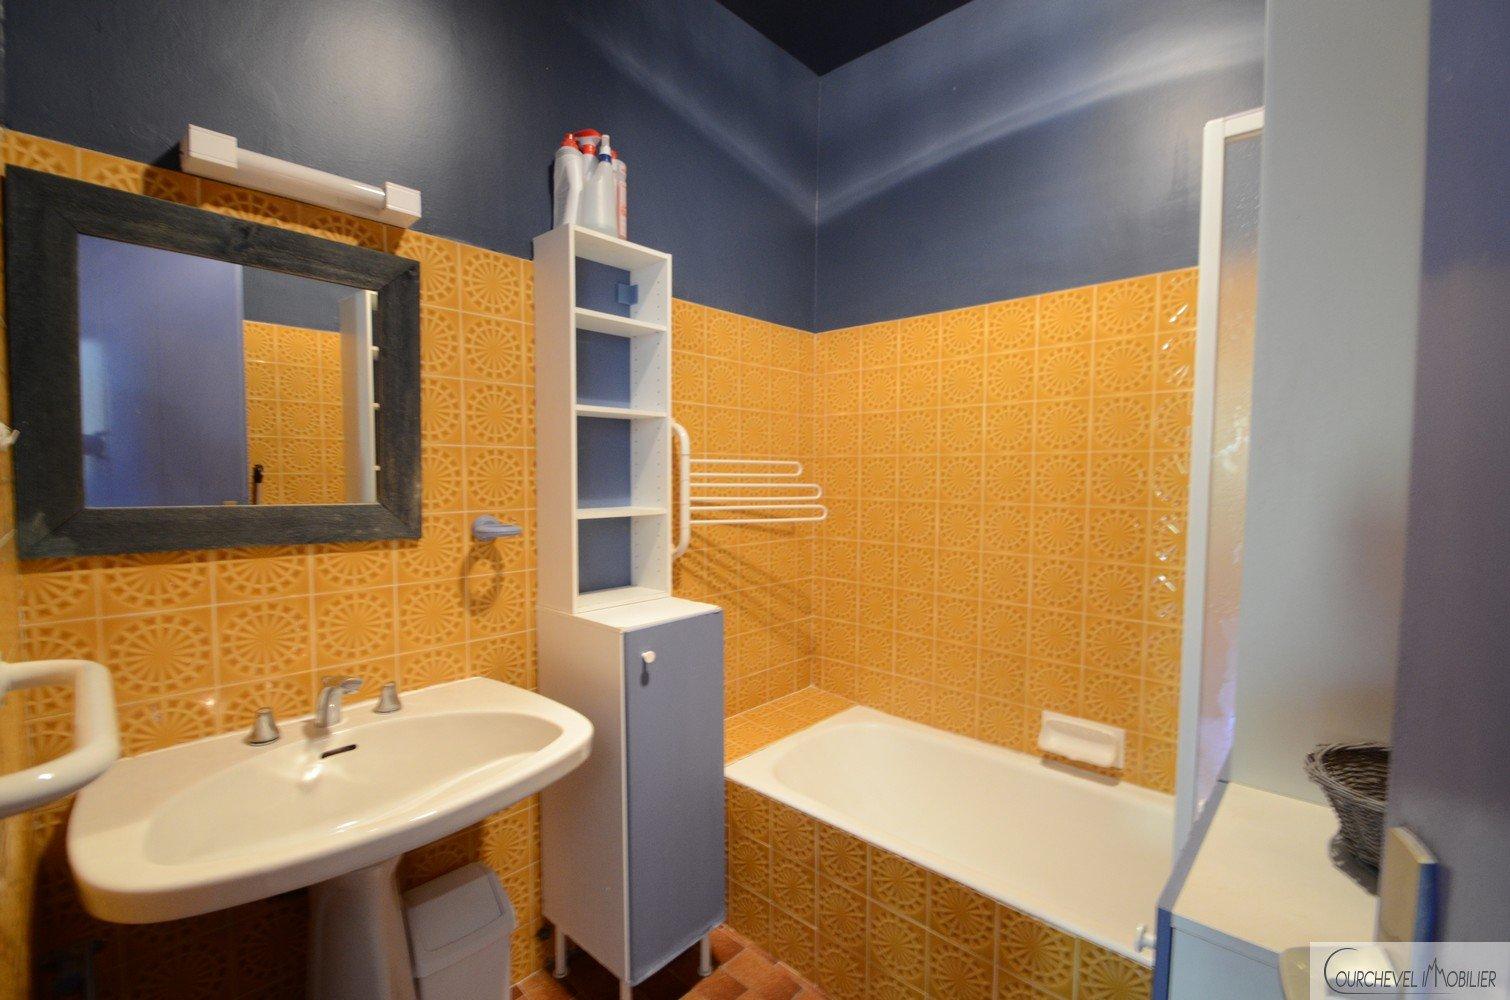 Pleasant 2 bedrooms apartment - Courchevel Moriond